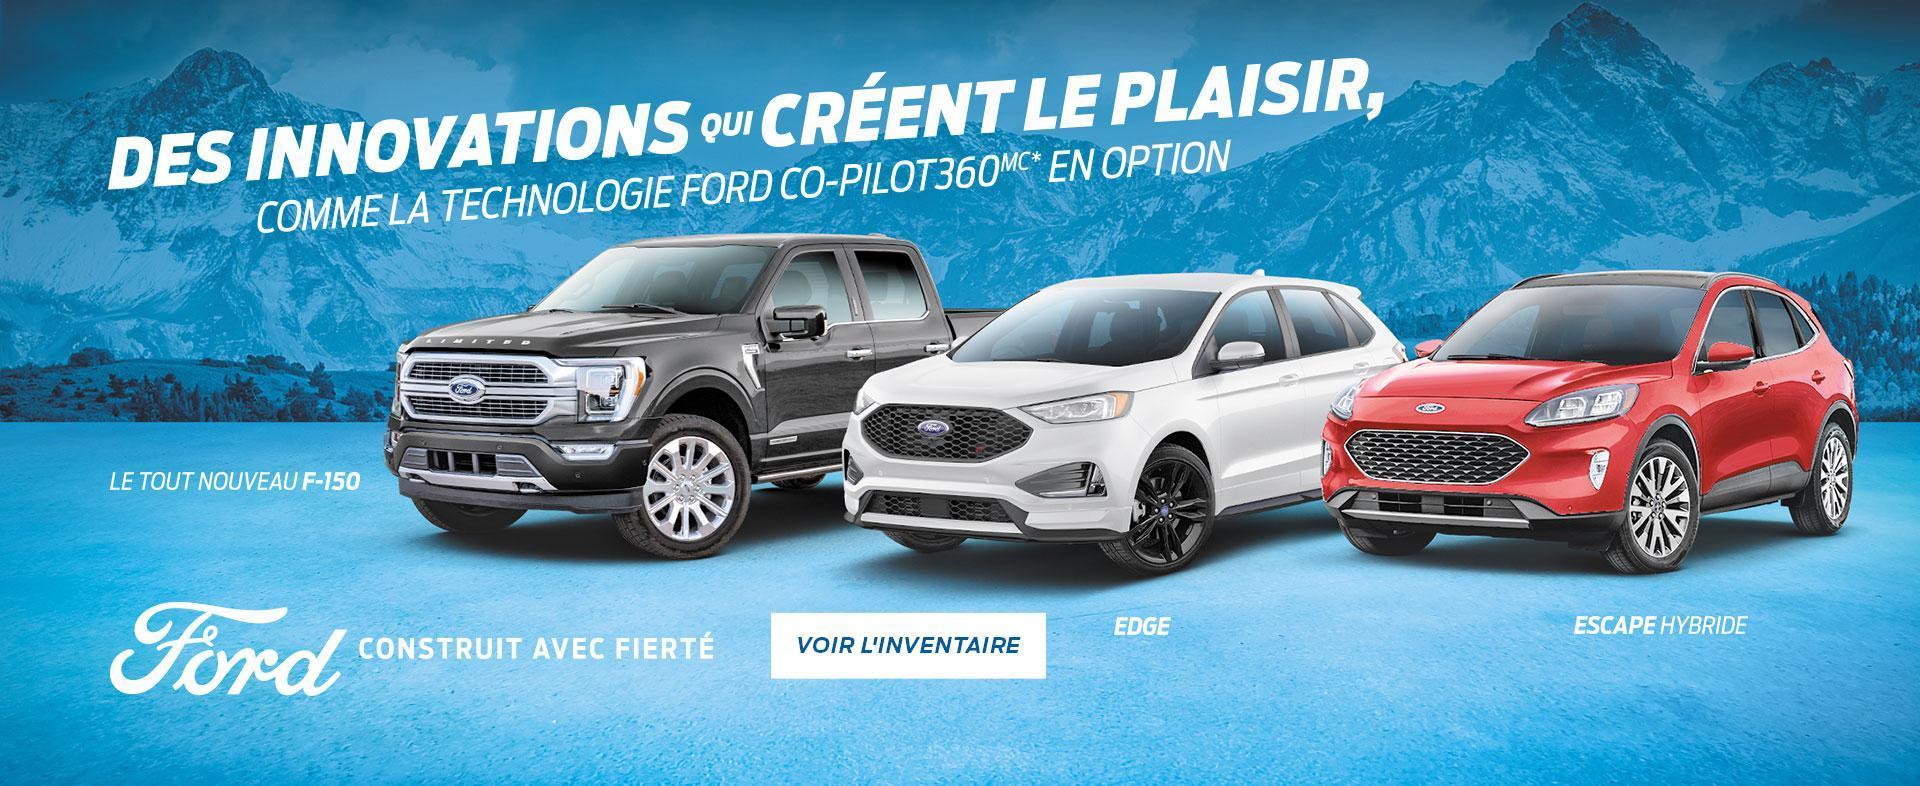 Ford Canada Une innovation qui suscite l'enthousiasme